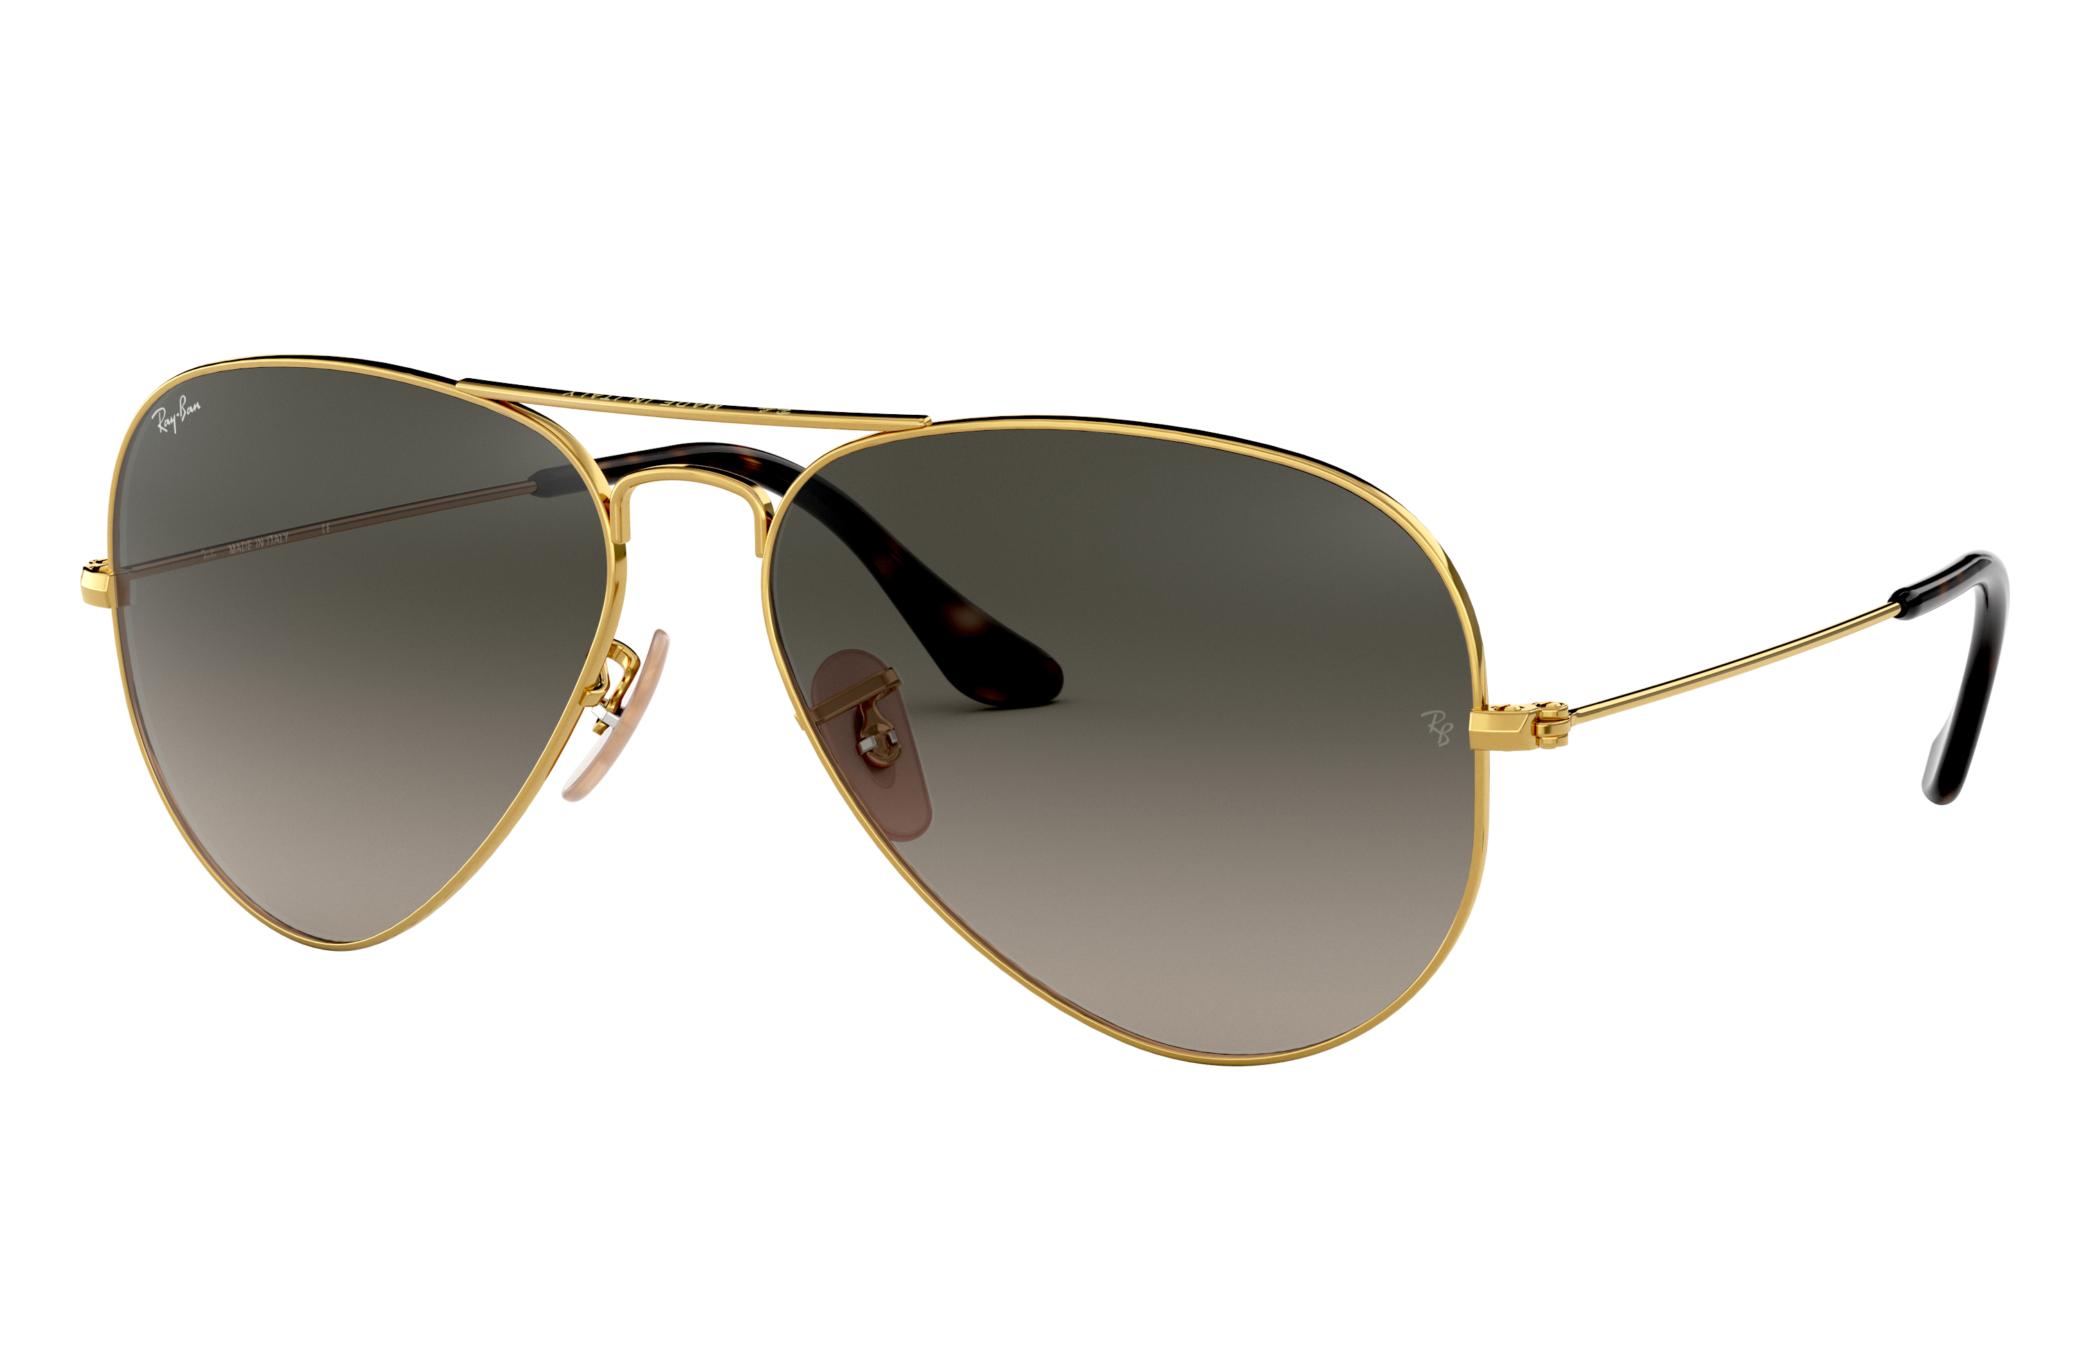 Ray-Ban Aviator Havana Collection Gold, Gray Lenses - RB3025